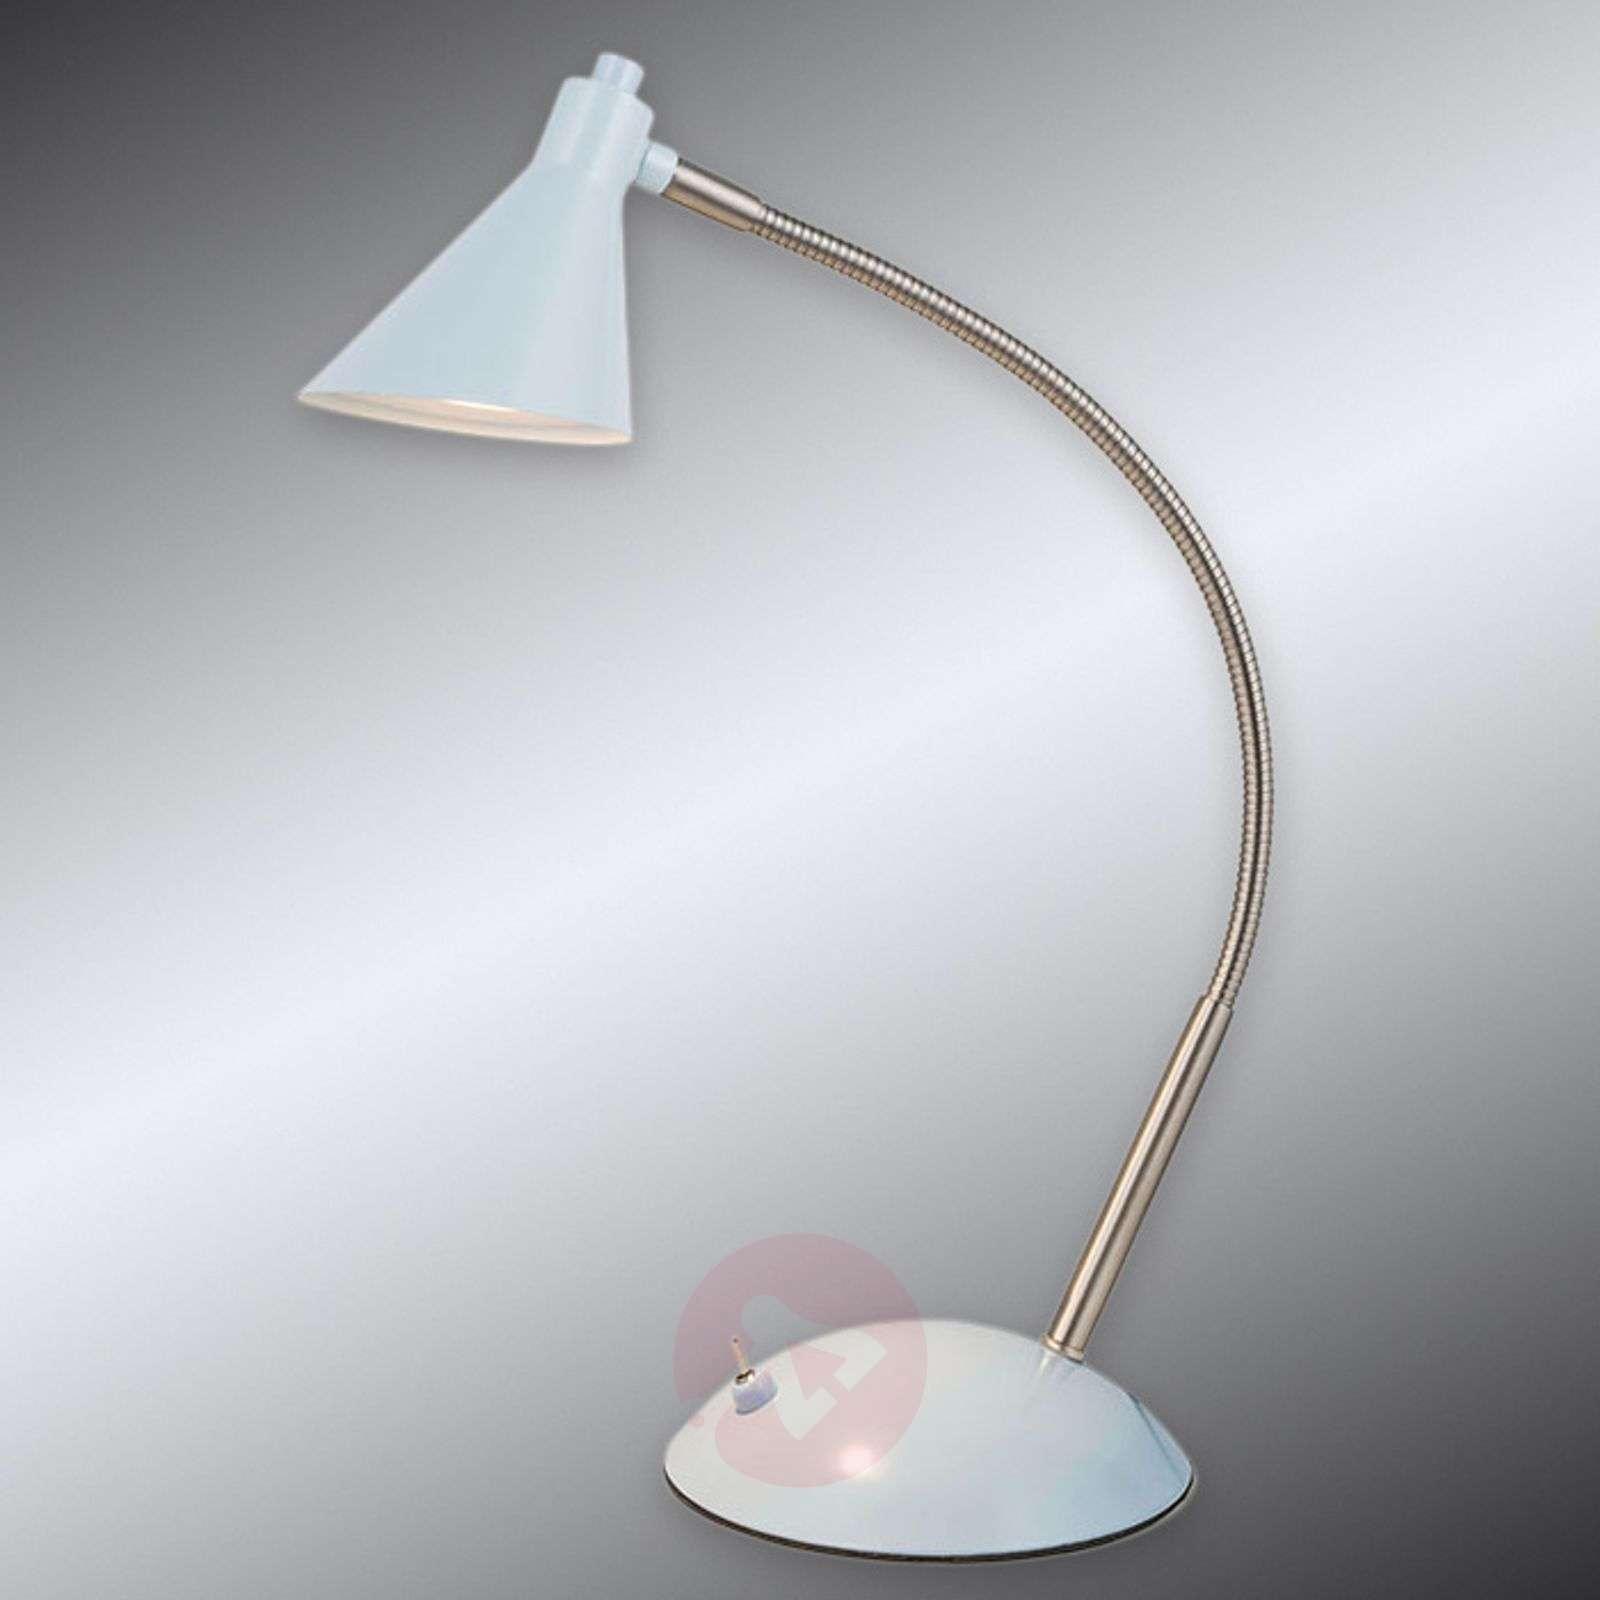 Light Blue Led Desk Lamp Milou 7000790 01